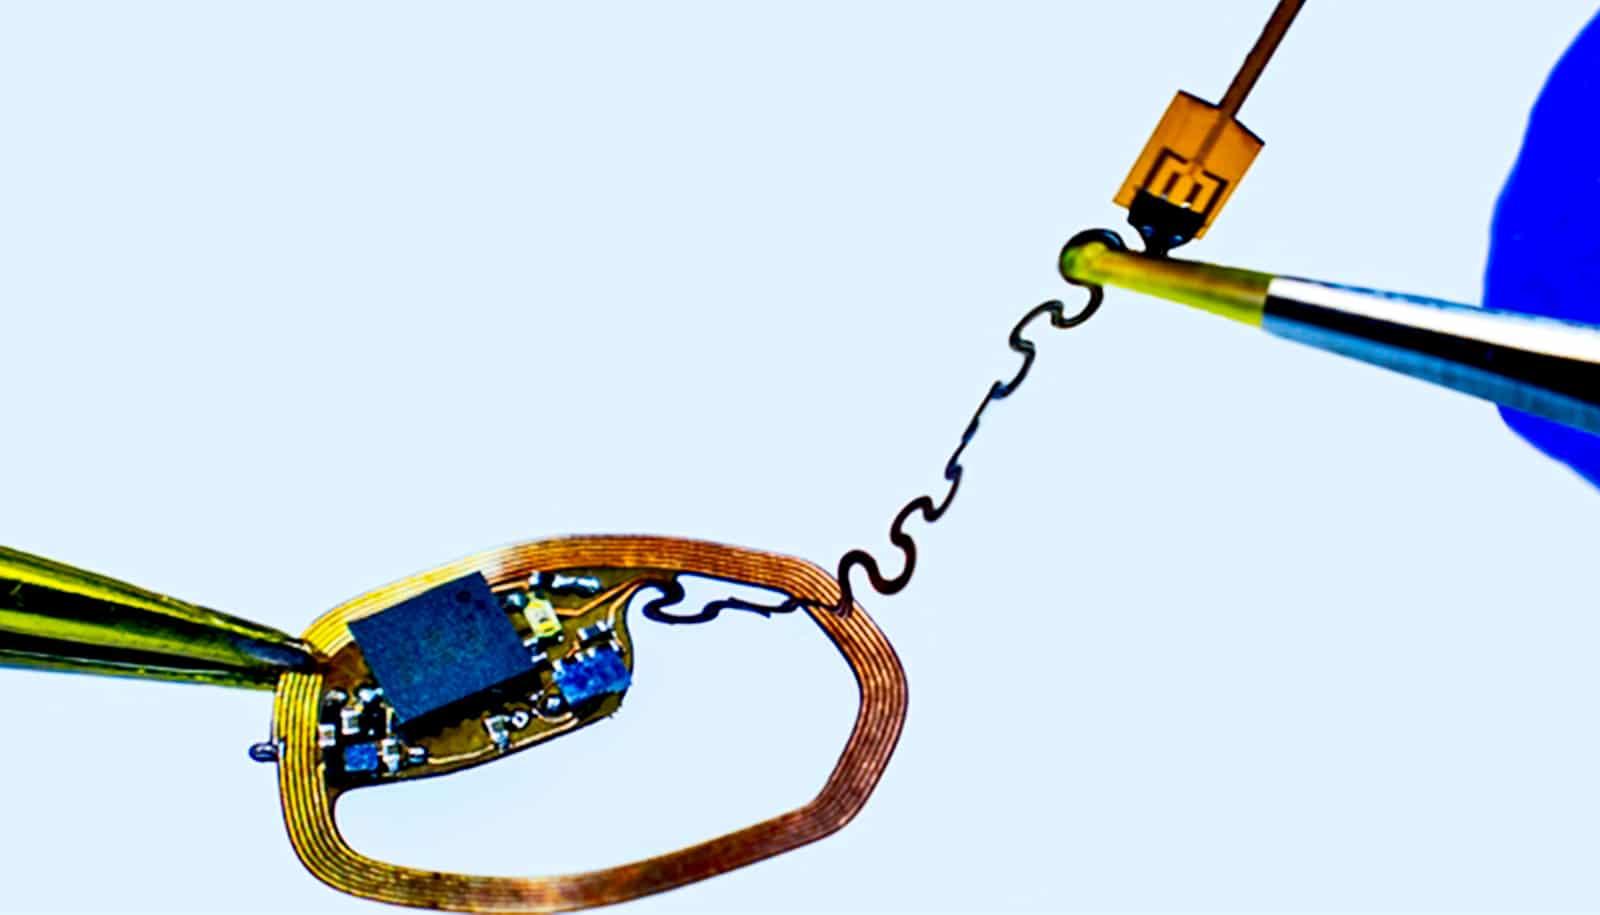 Tiny device records single neurons in the brain - Futurity